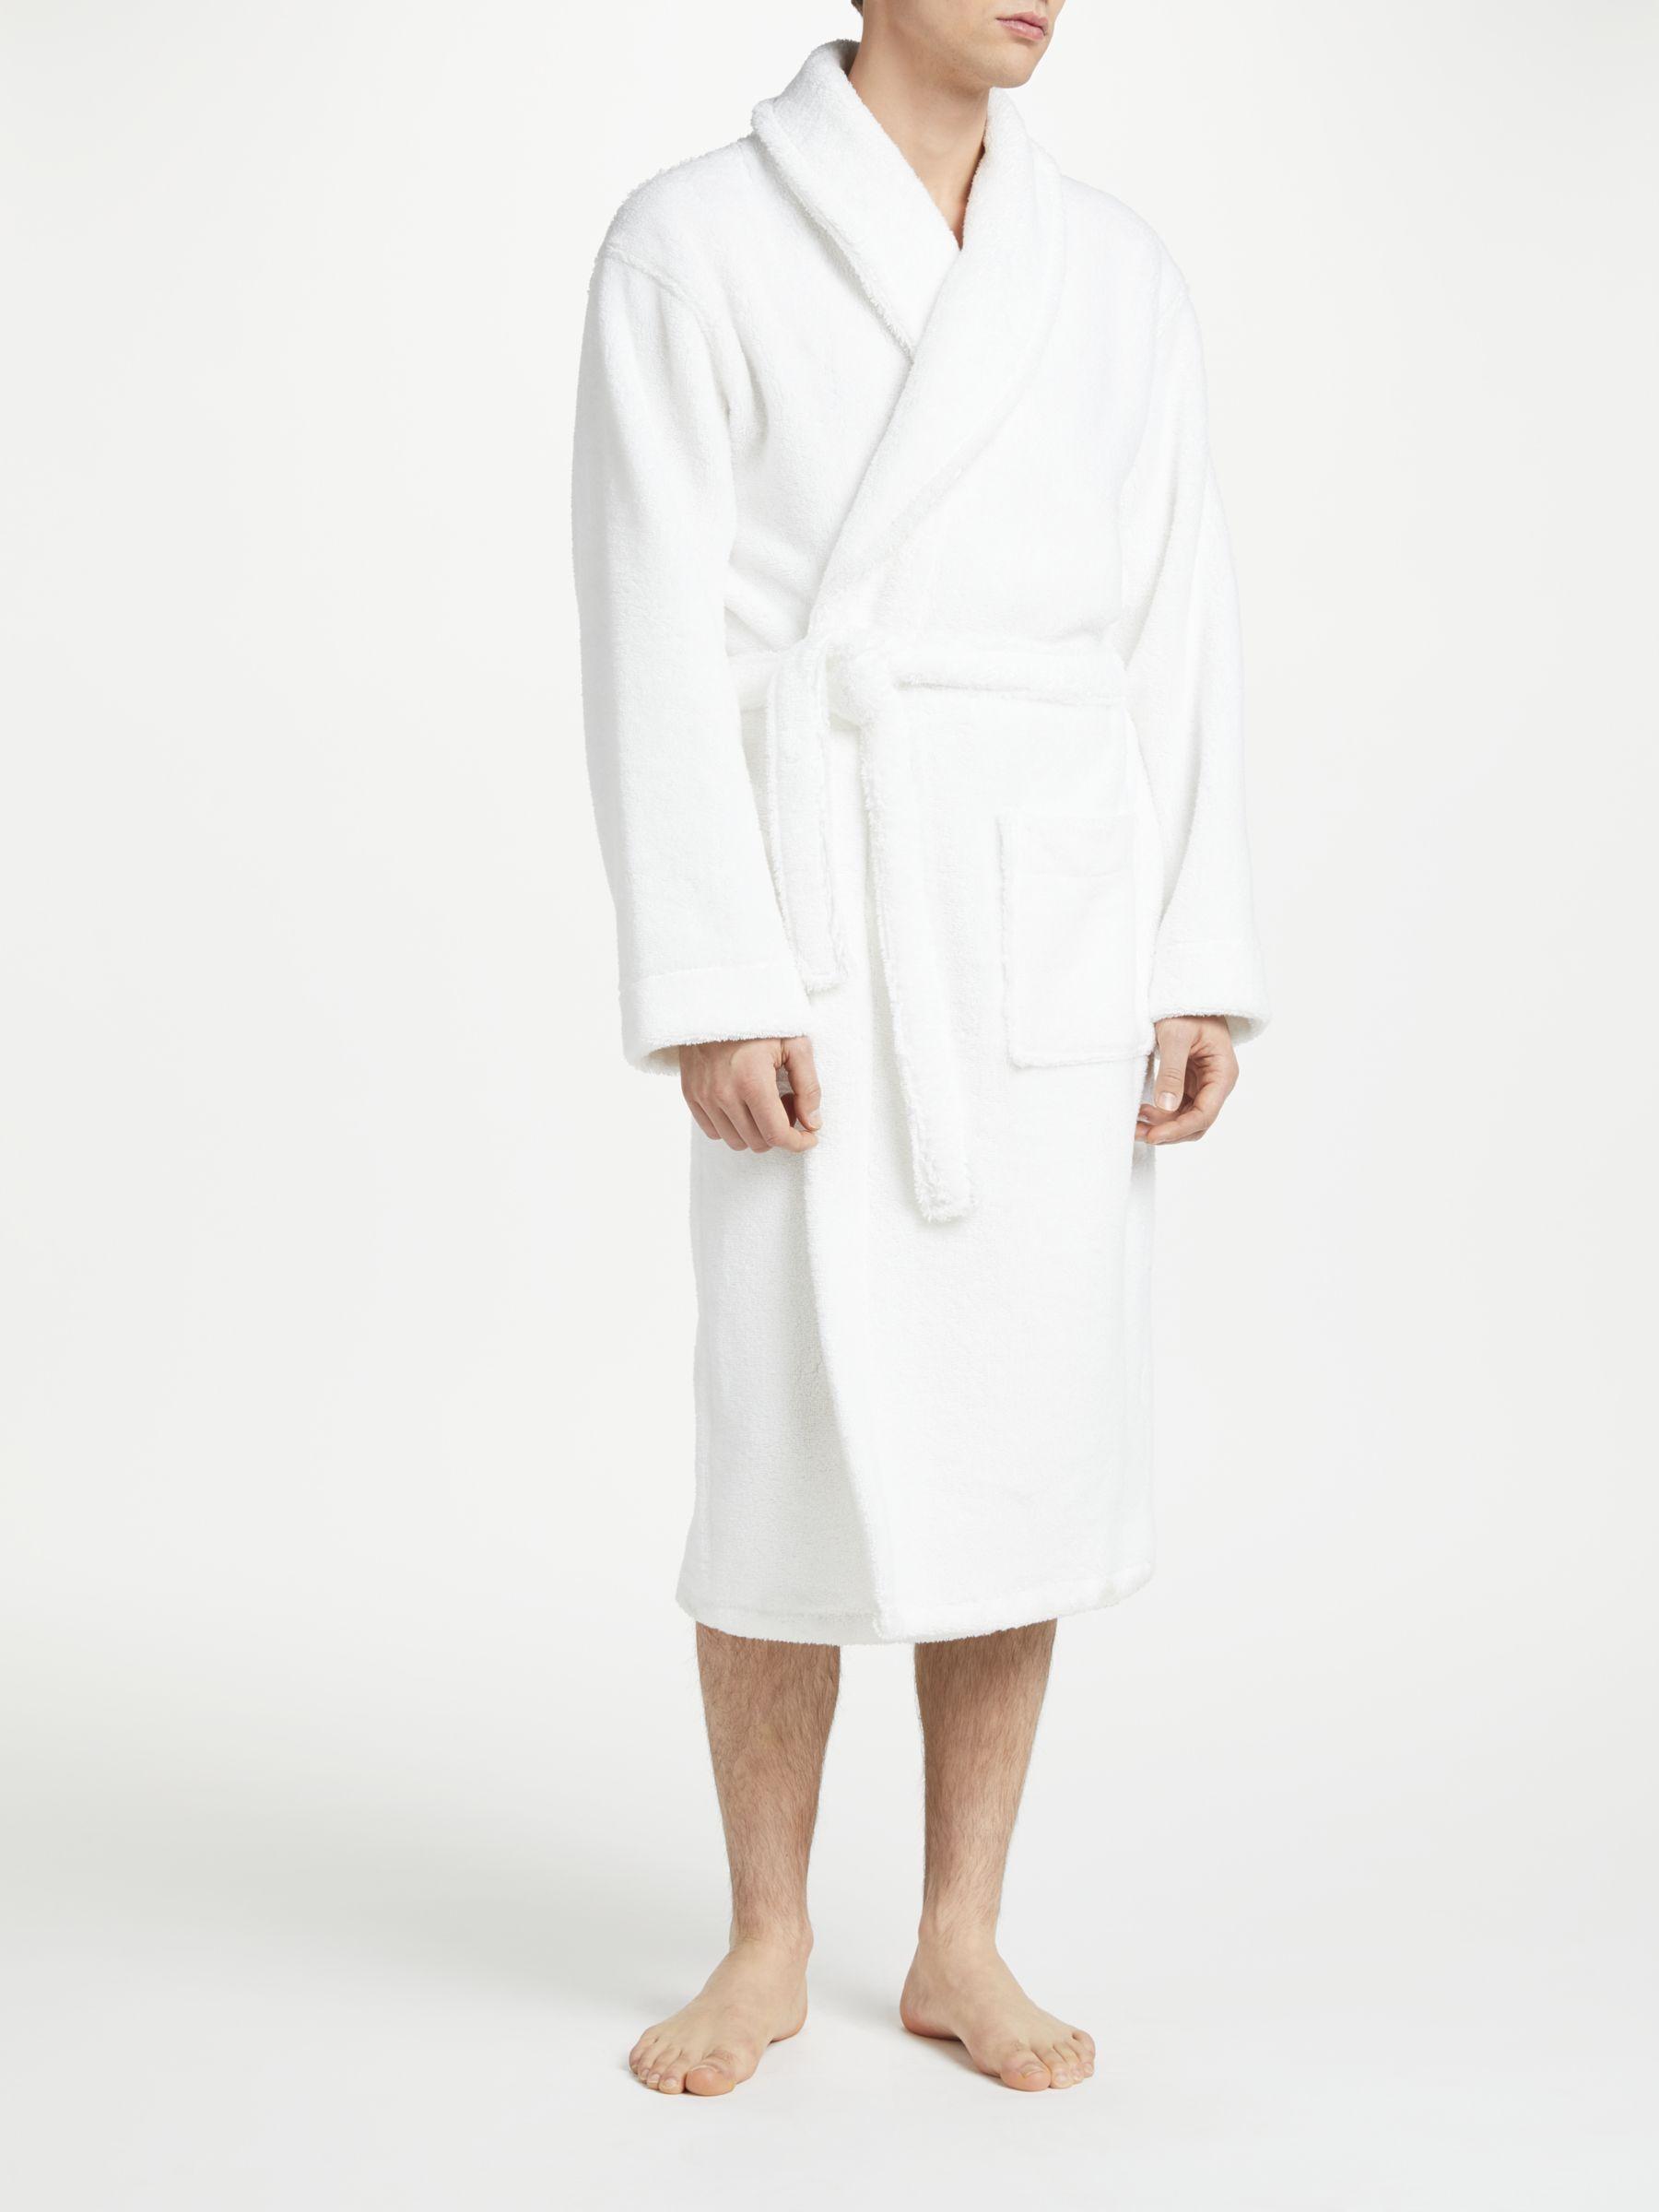 John Lewis Partners Towelling Cotton Robe White At John Lewis Partners